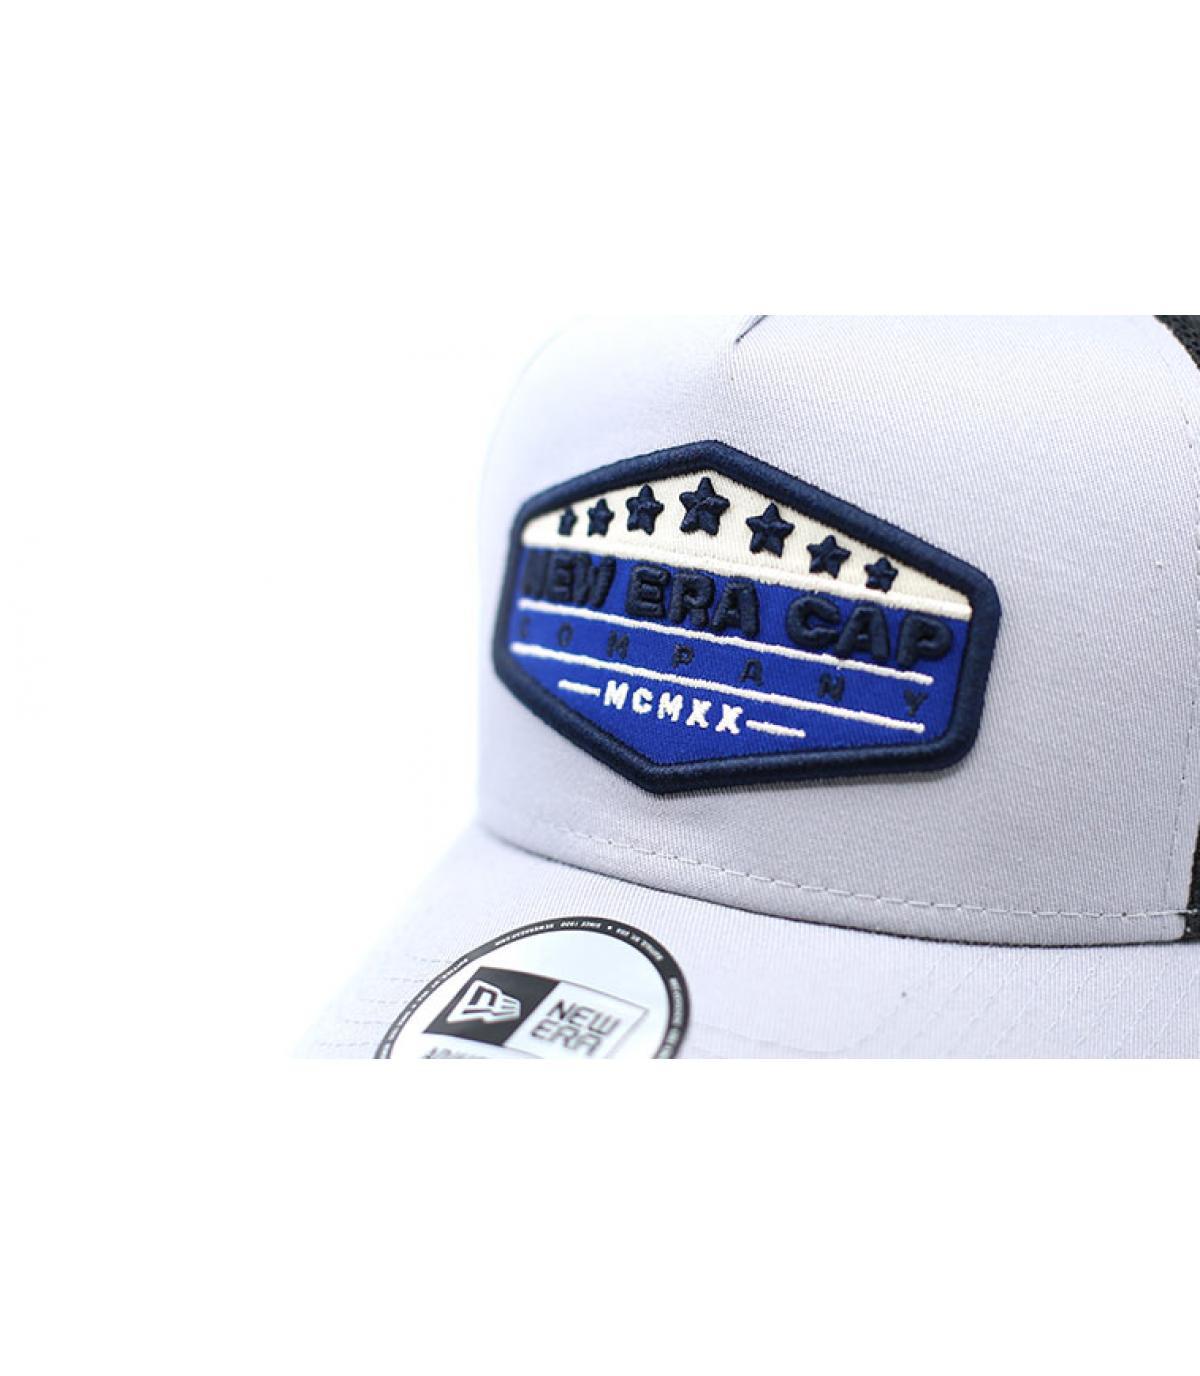 Dettagli Patch Trucker NE gray blue - image 3